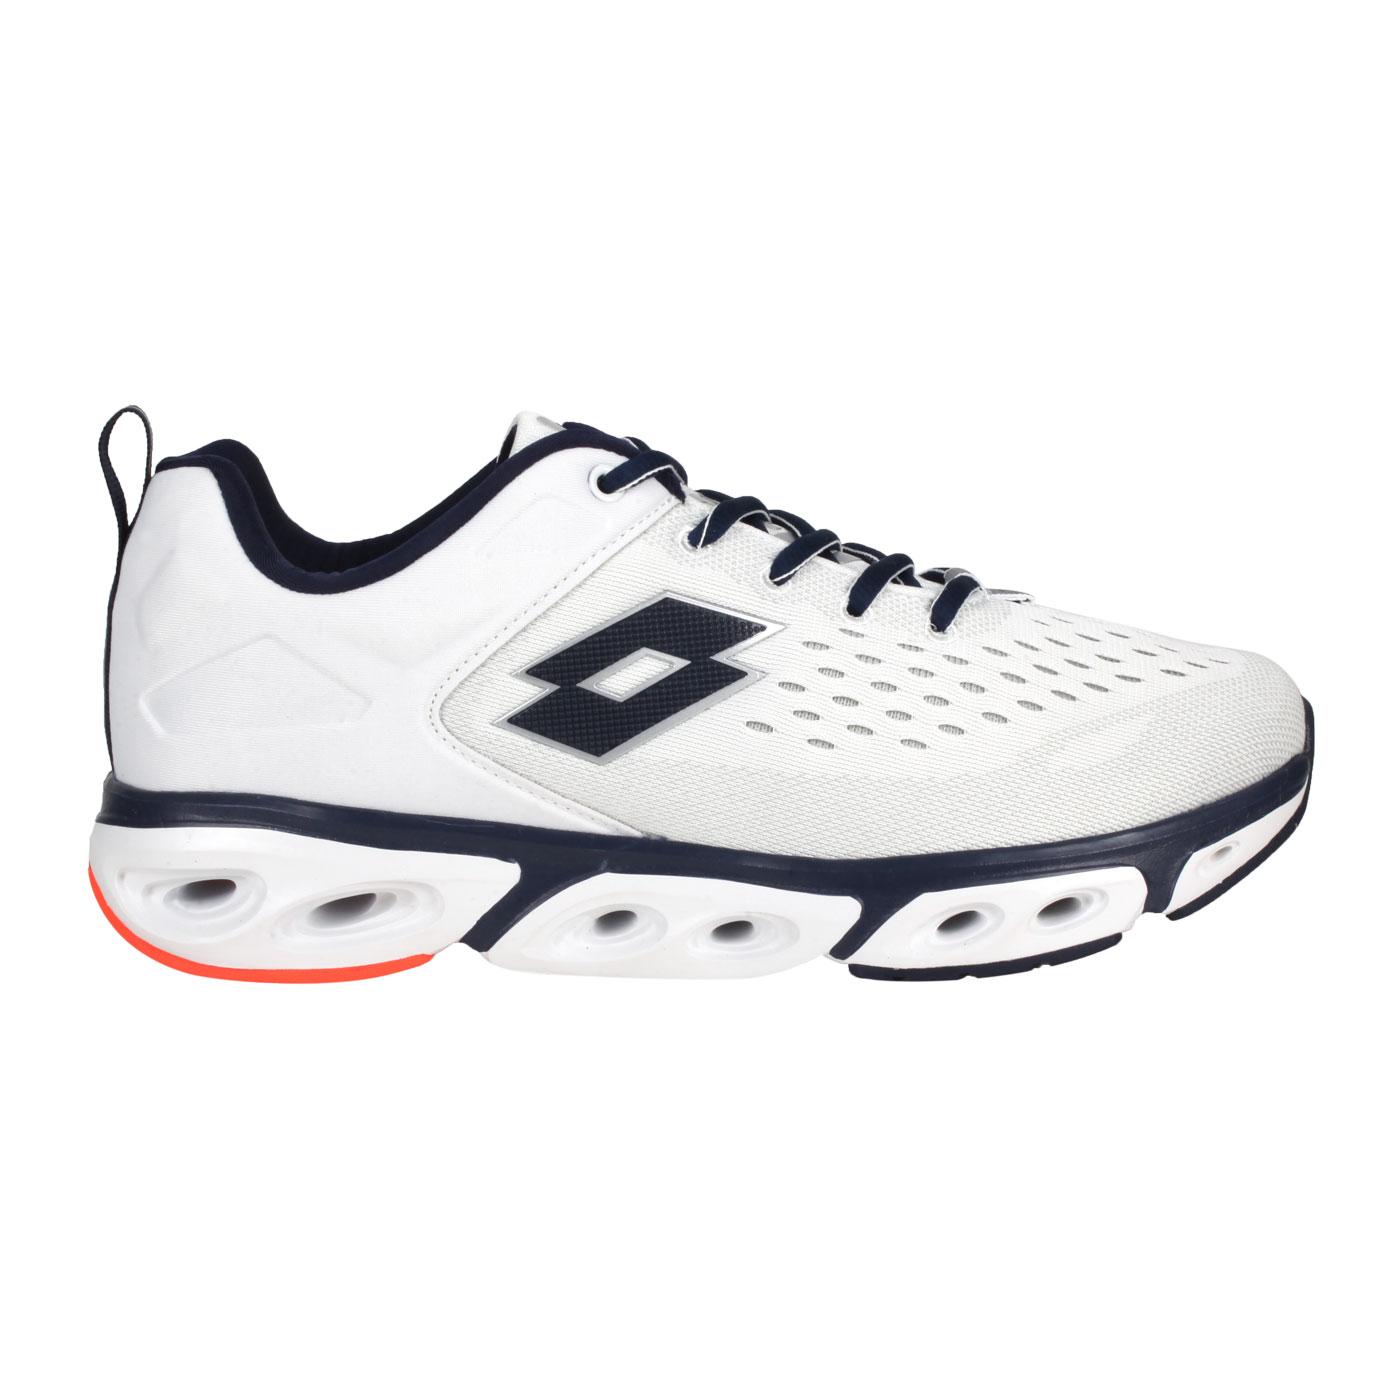 LOTTO 男款風動運動鞋 LT1AMR3599 - 白丈青